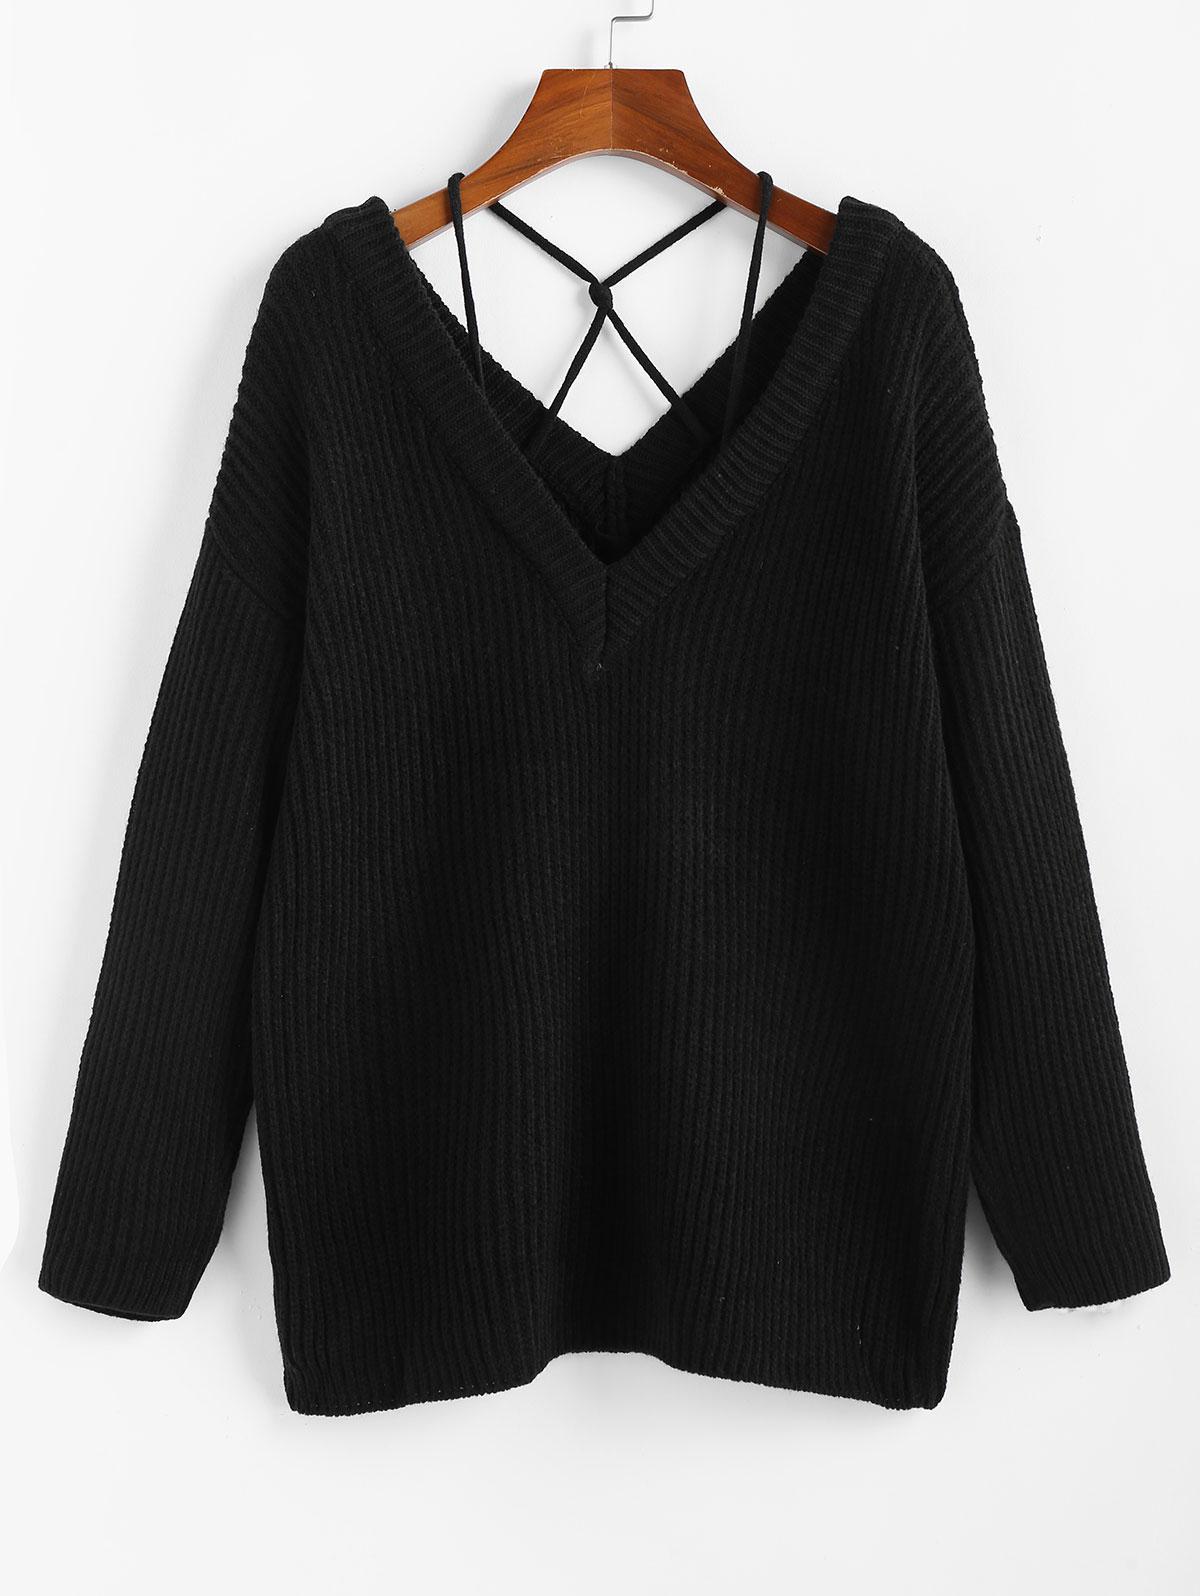 ZAFUL Plunging Drop Shoulder Criss Cross Jumper Sweater